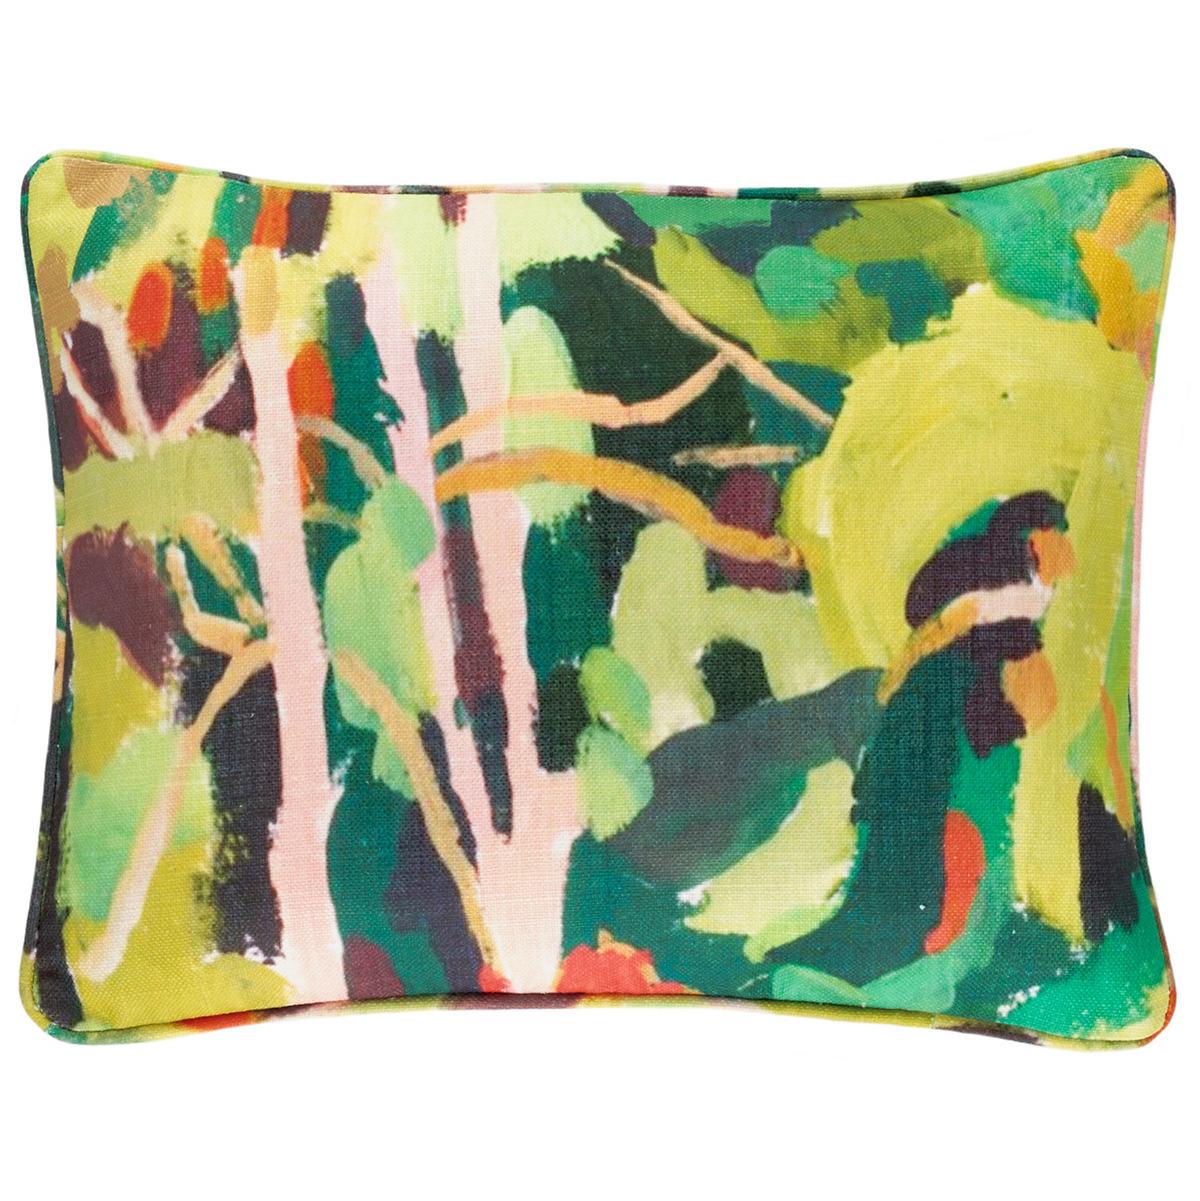 Rain Forest Canopy Indoor/Outdoor Decorative Pillow